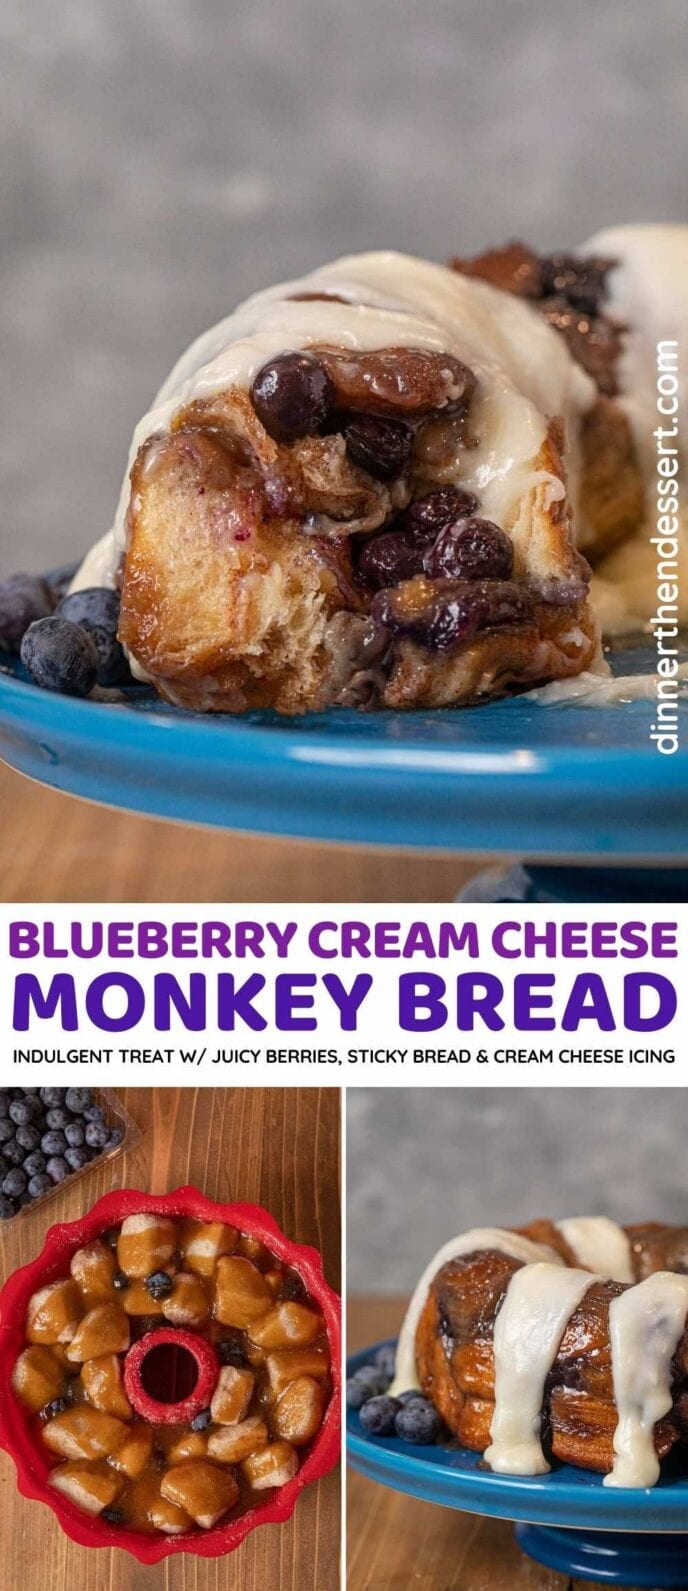 Blueberry Cream Cheese Monkey Bread collage